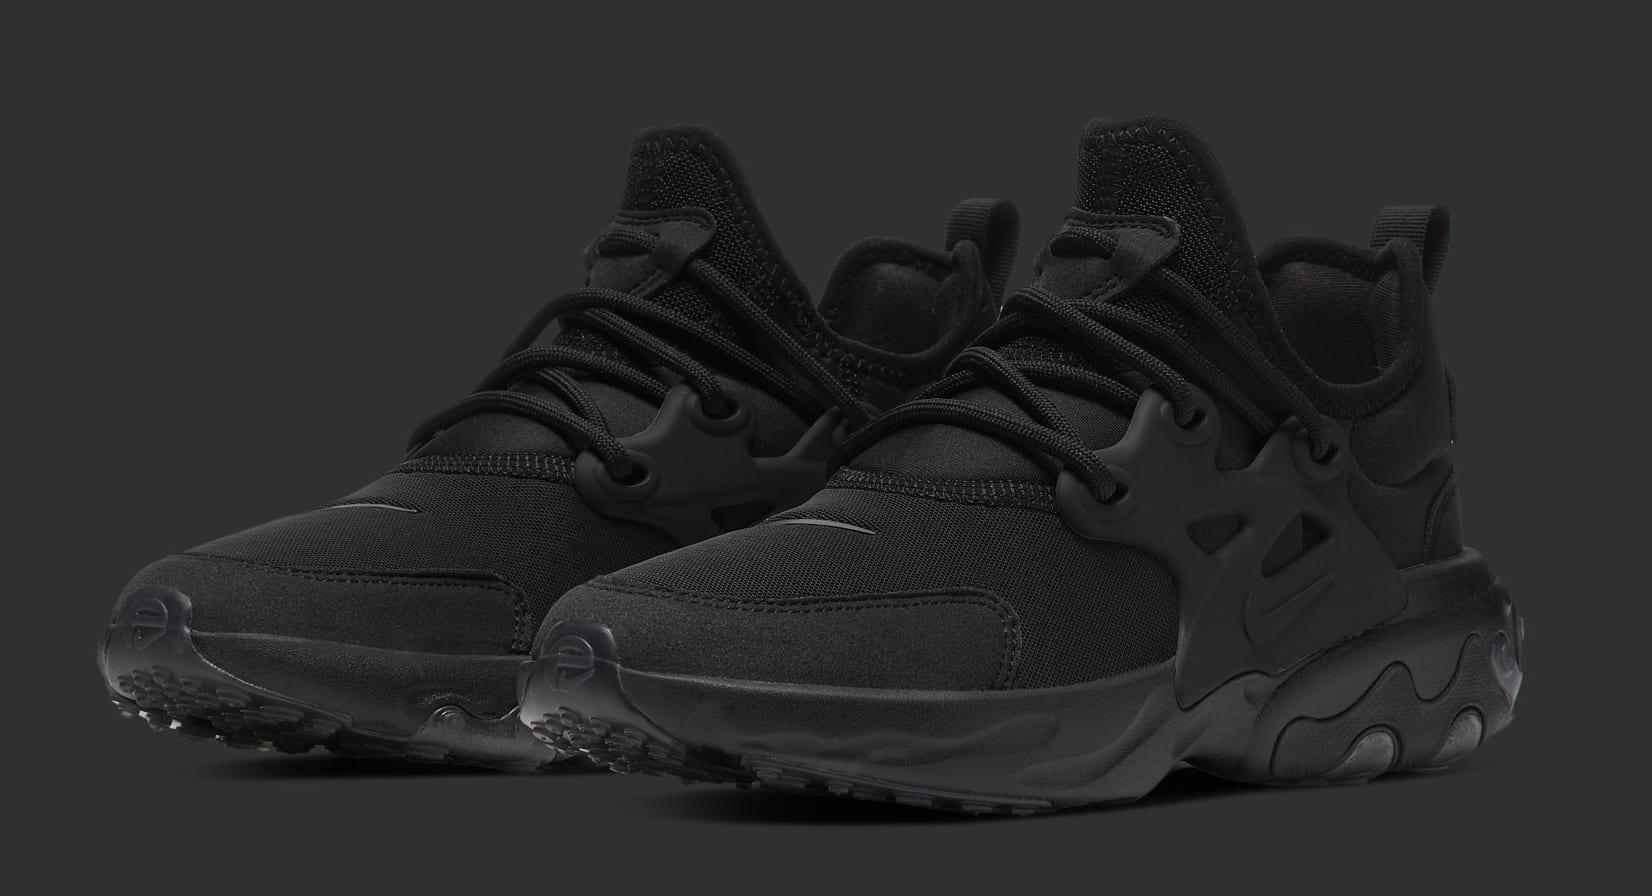 Nike Presto React BQ4002-005 (Pair)